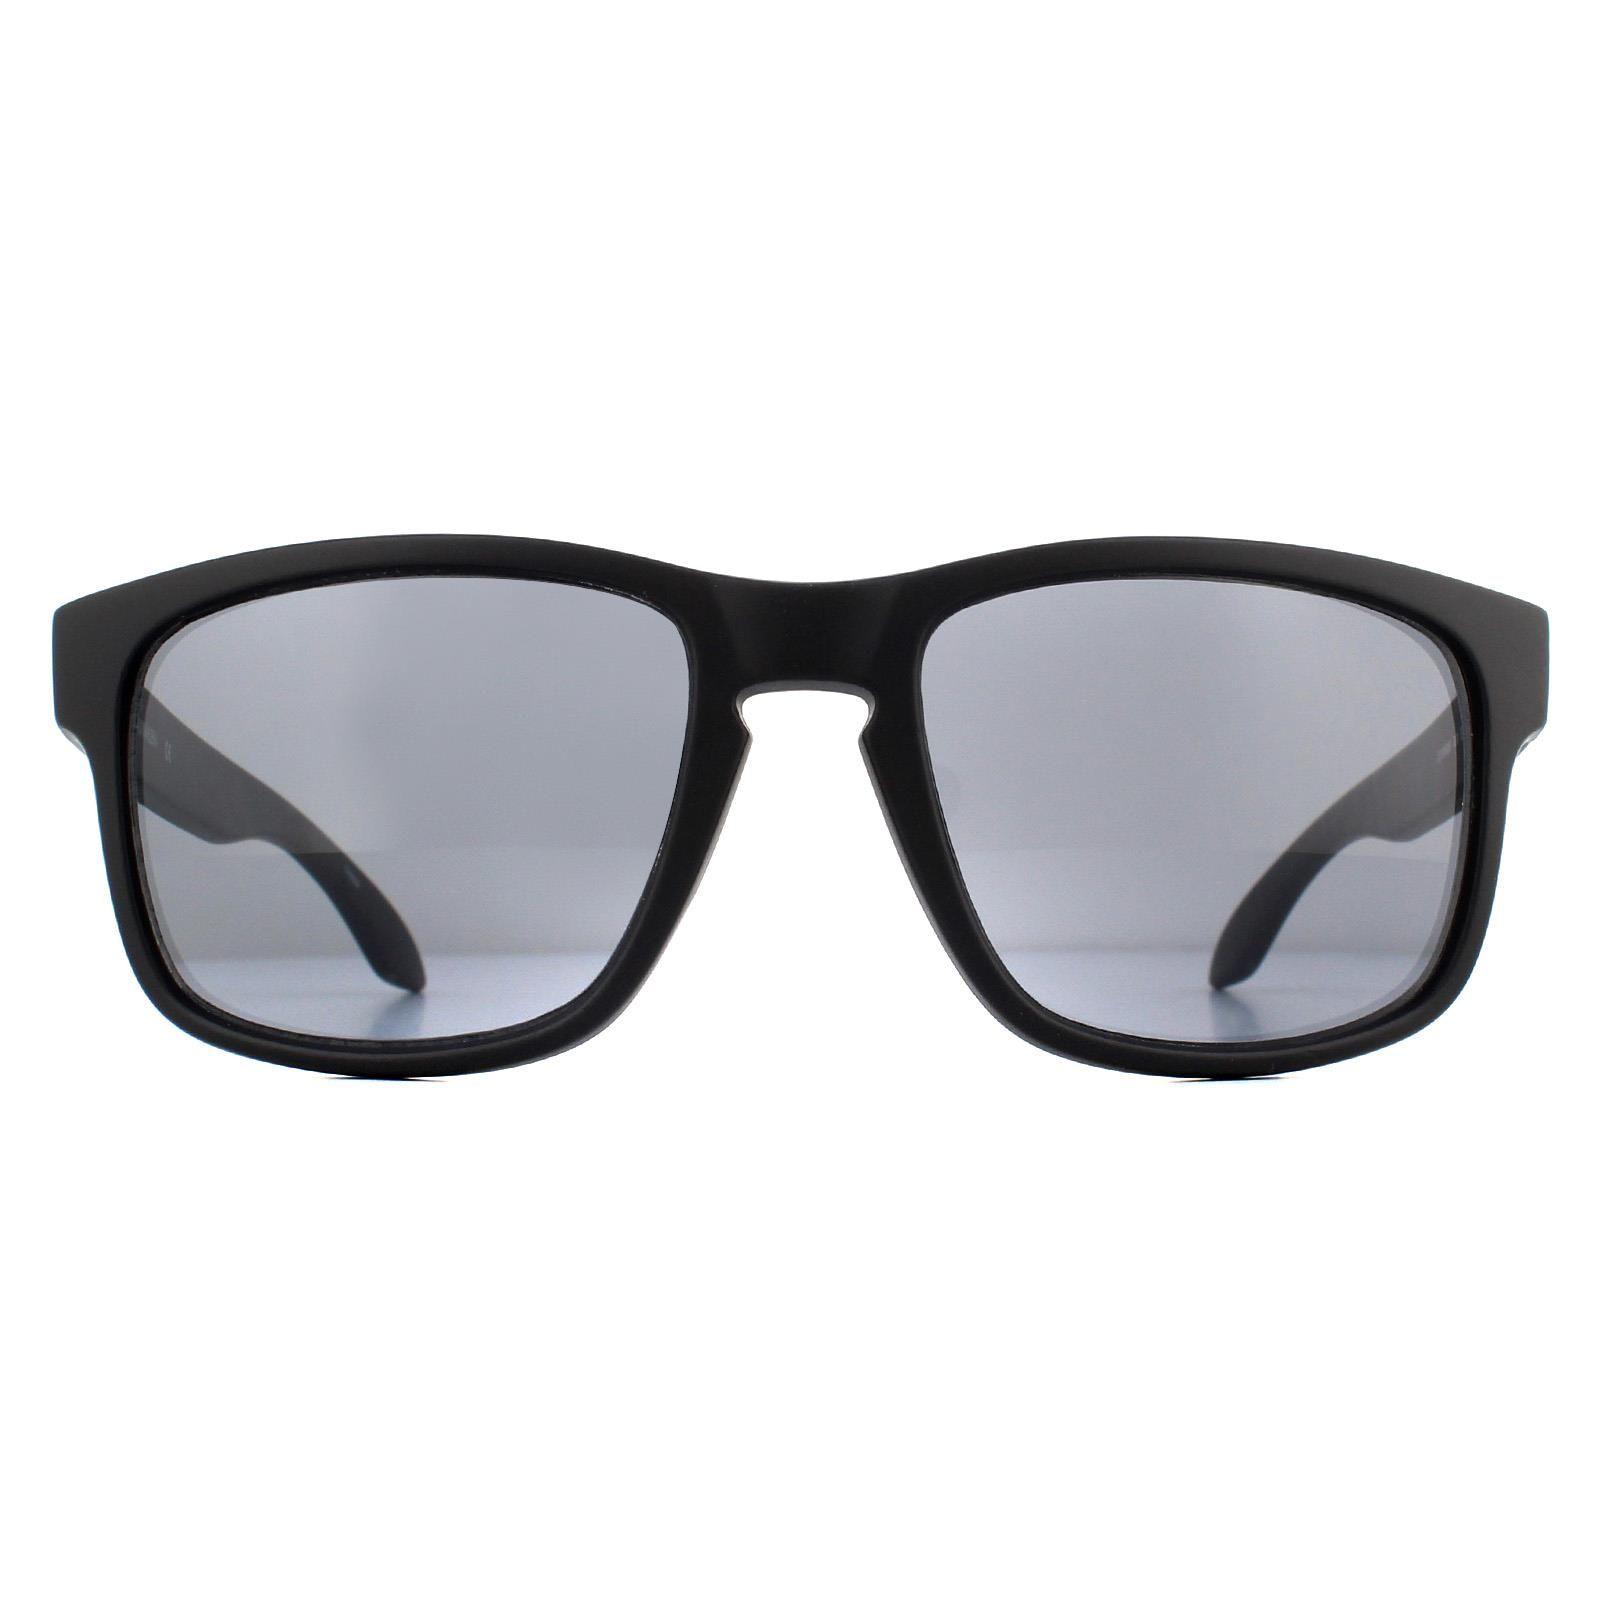 Calvin Klein Sunglasses CK19566S 001 Matte Black Grey